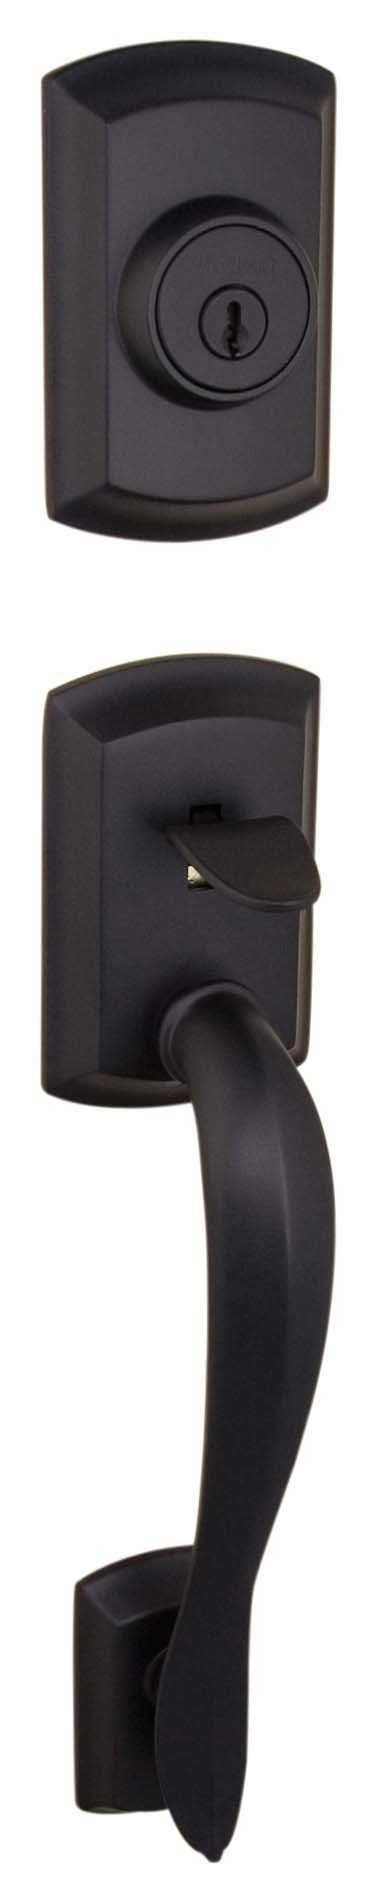 Kwikset 800AVH Lip 514 SMT Avalon Single Cylinder Handleset, Exterior Only, Iron Black